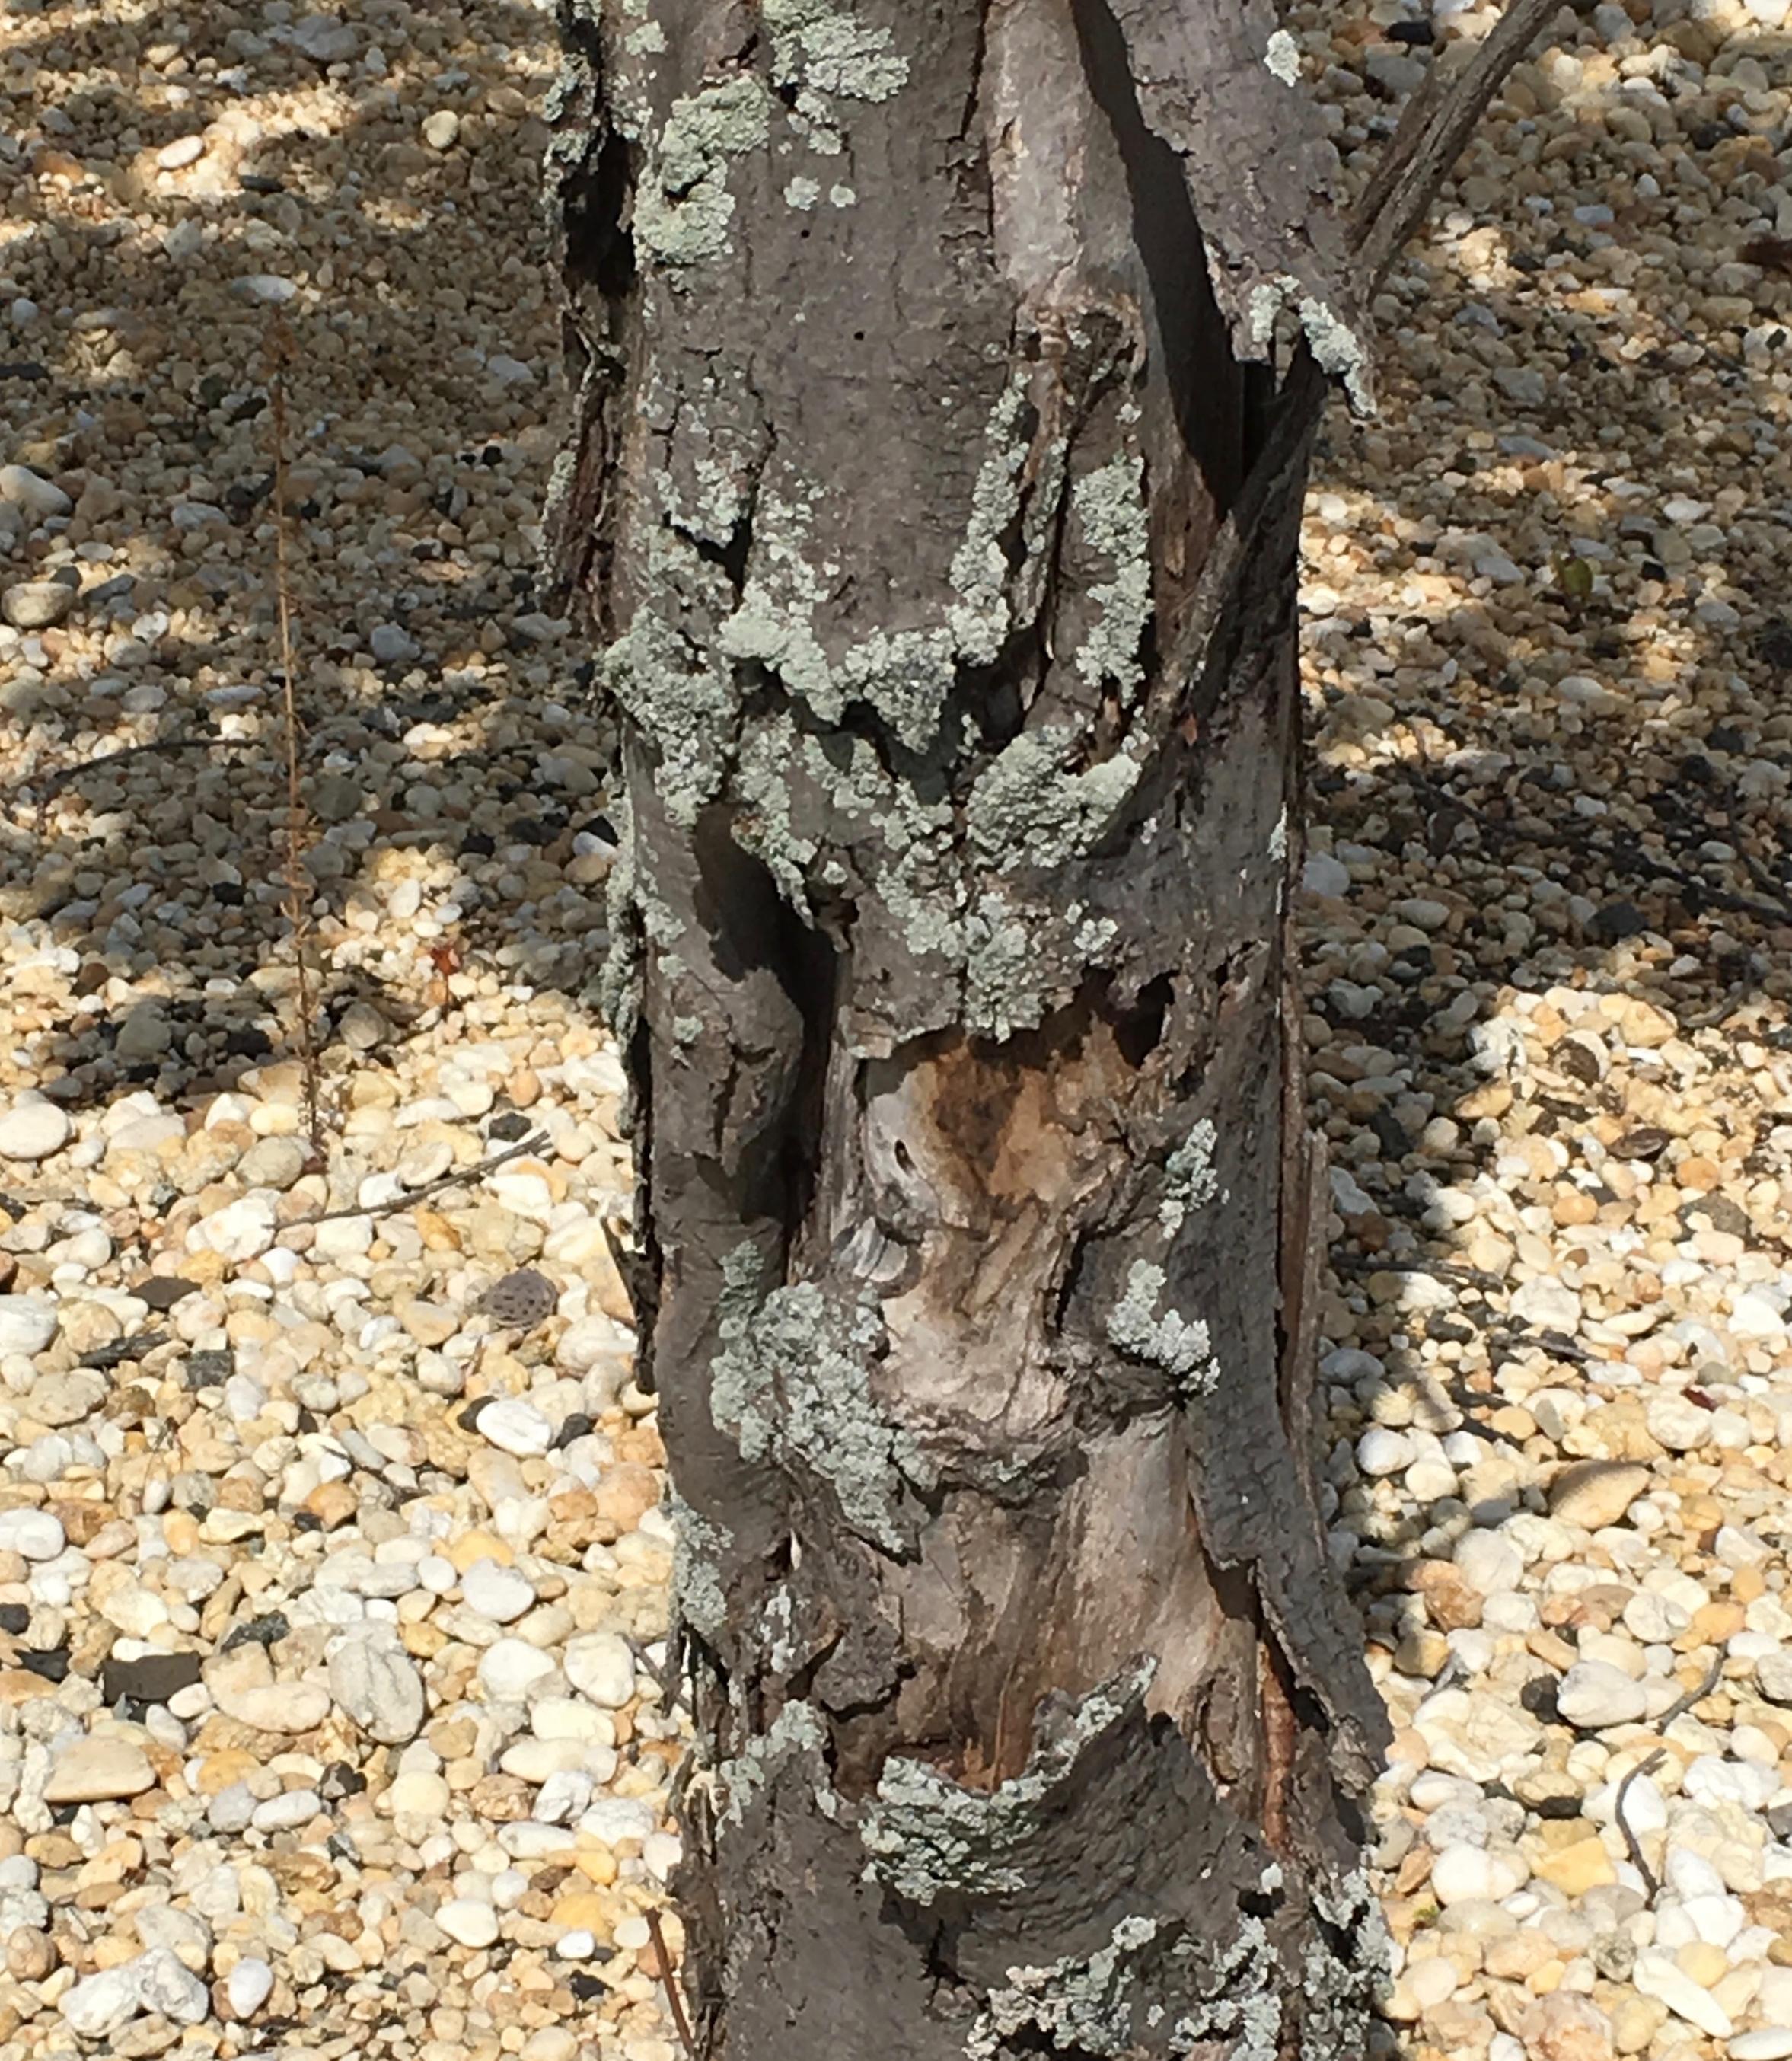 tree bark with fungus